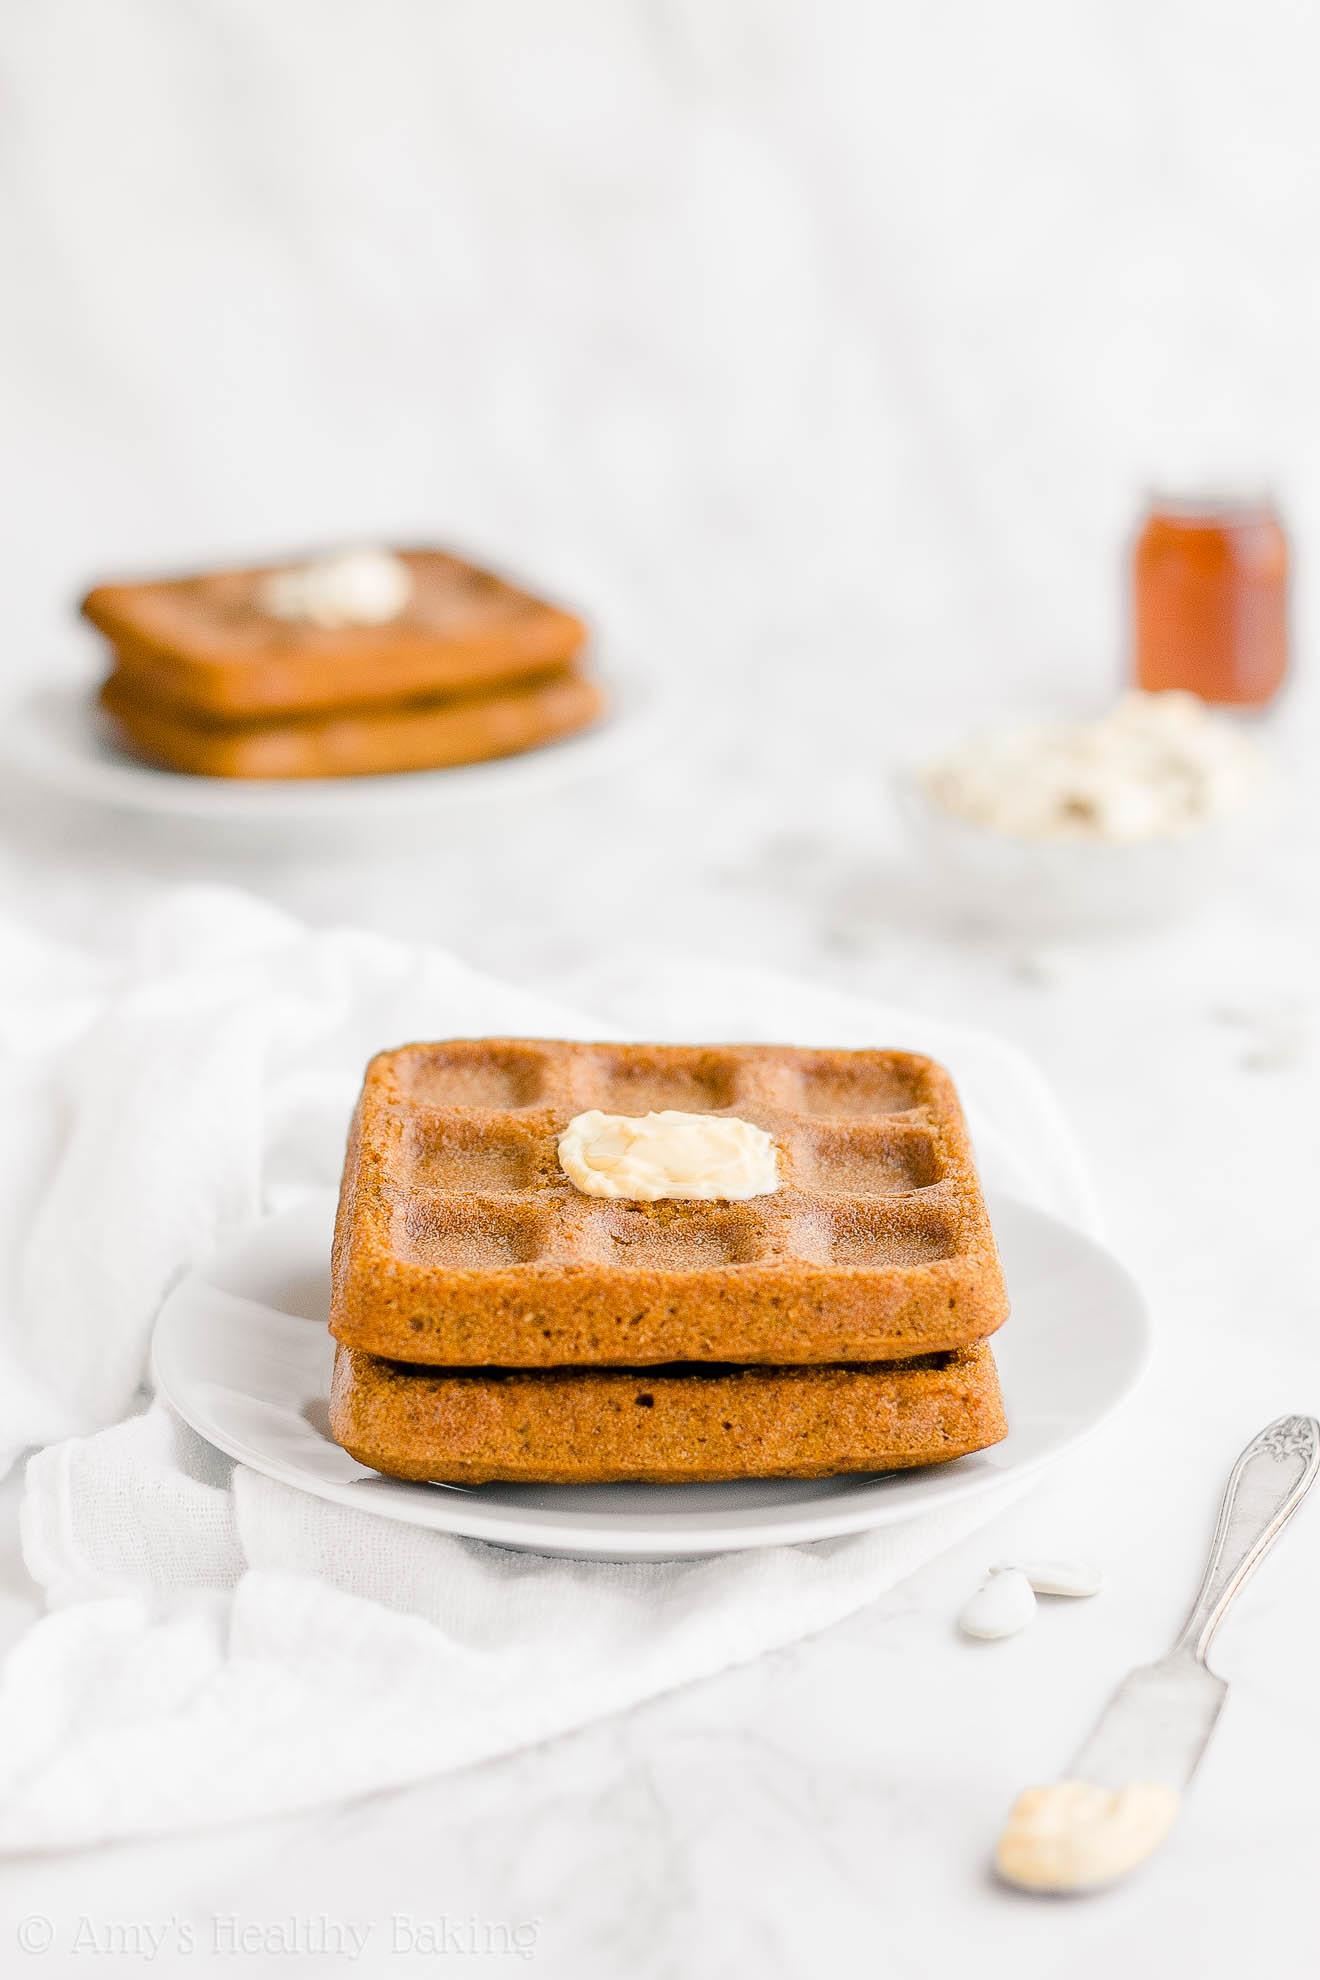 Best Healthy Clean Eating Low Sugar Fluffy Pumpkin Waffles